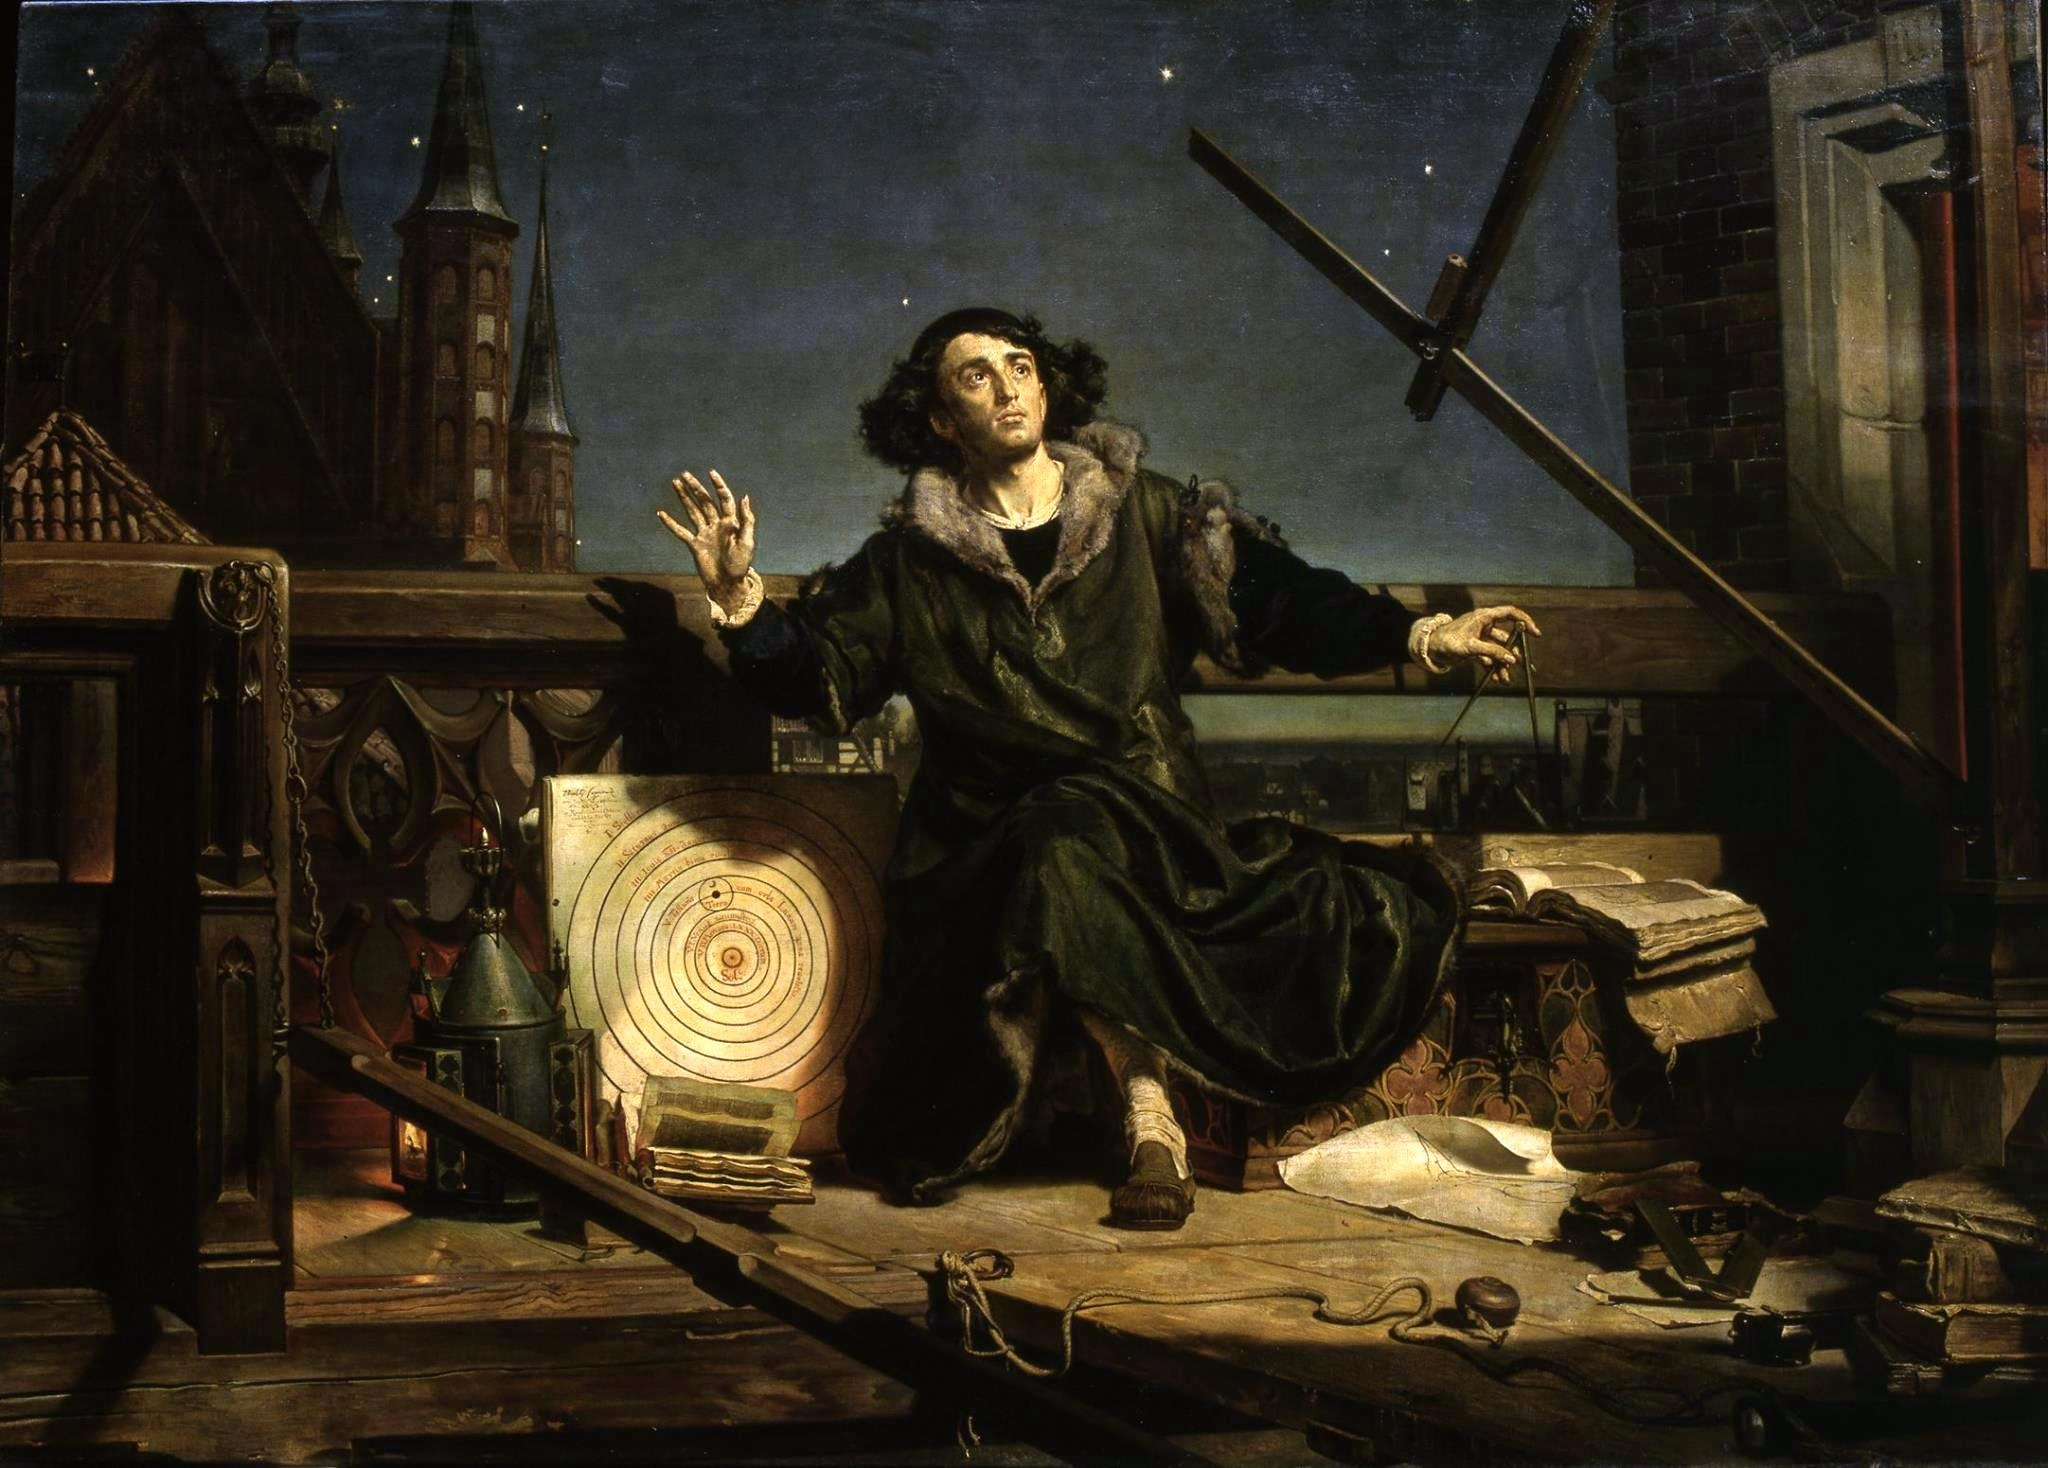 Nicolaus Copernic1